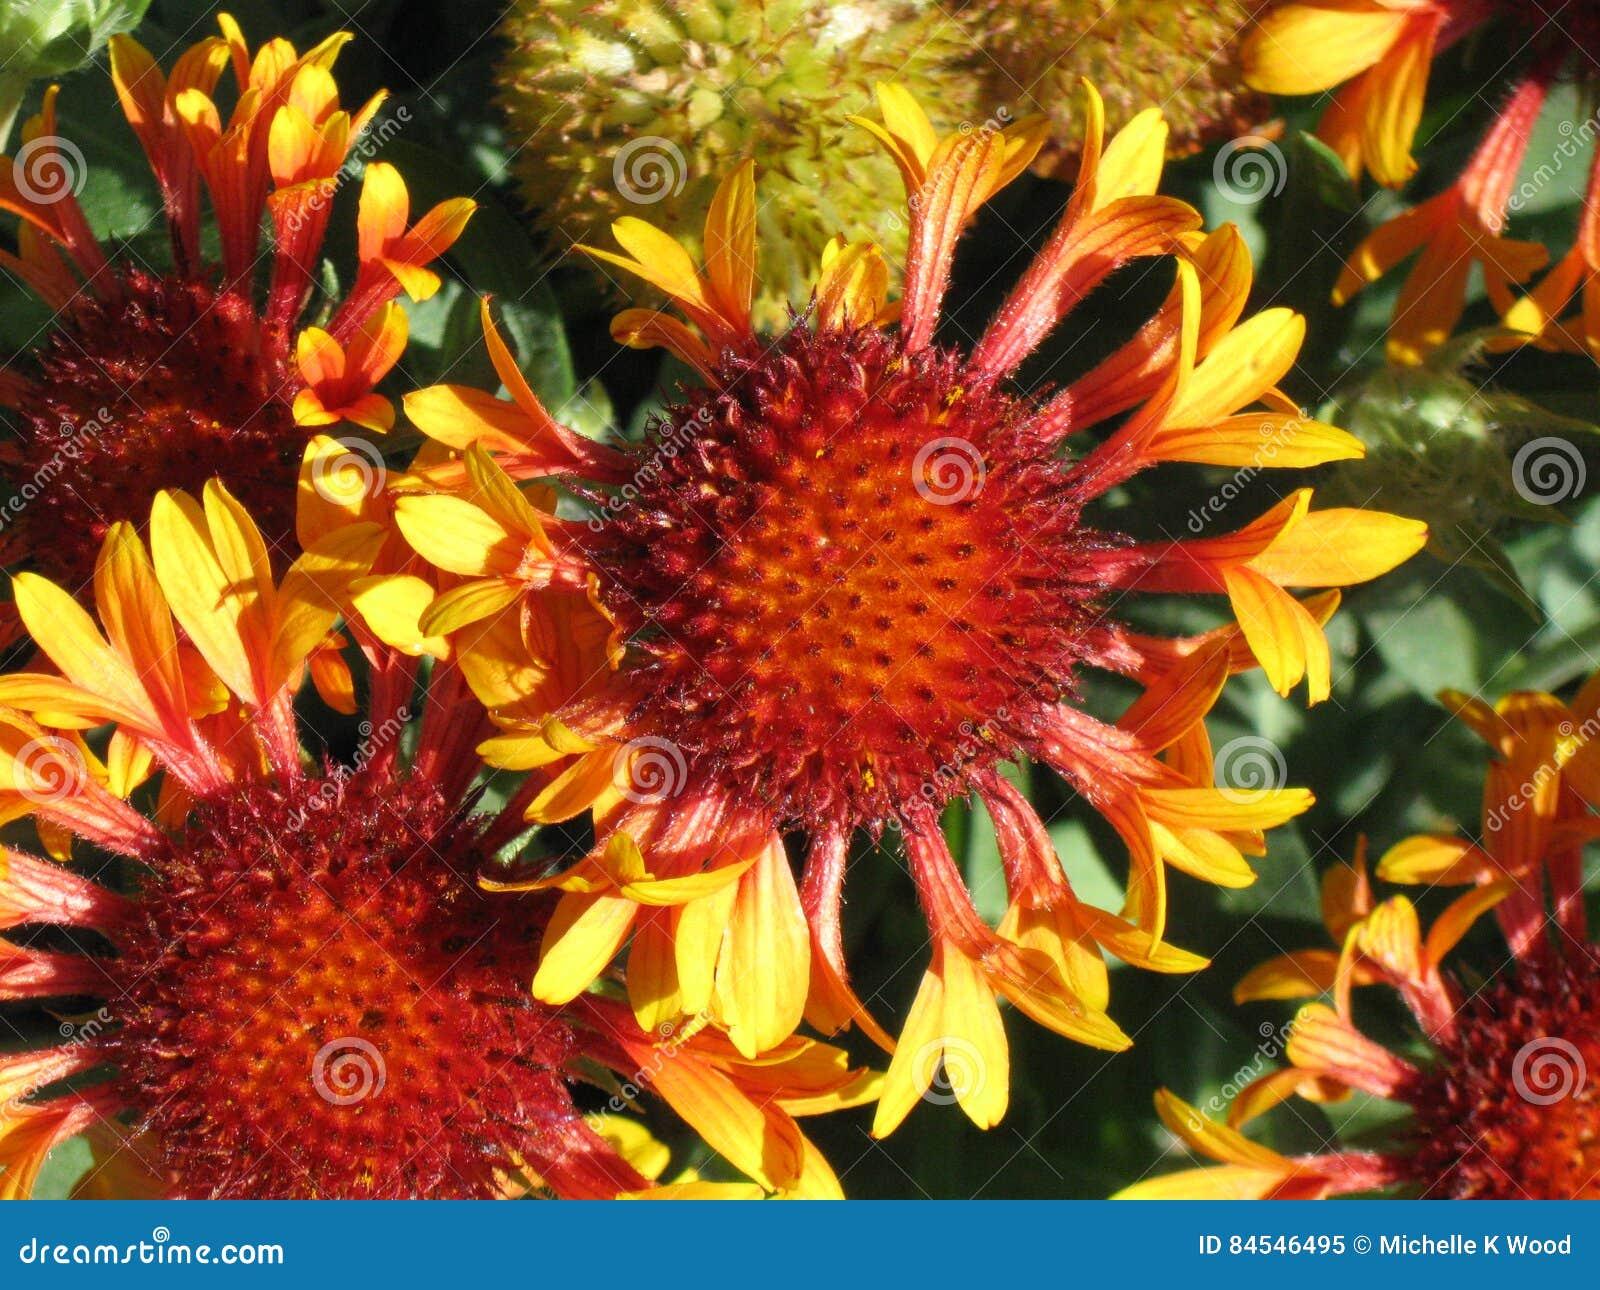 Gaillardia Grandiflora Blanket Flower Stock Image Image Of Petals